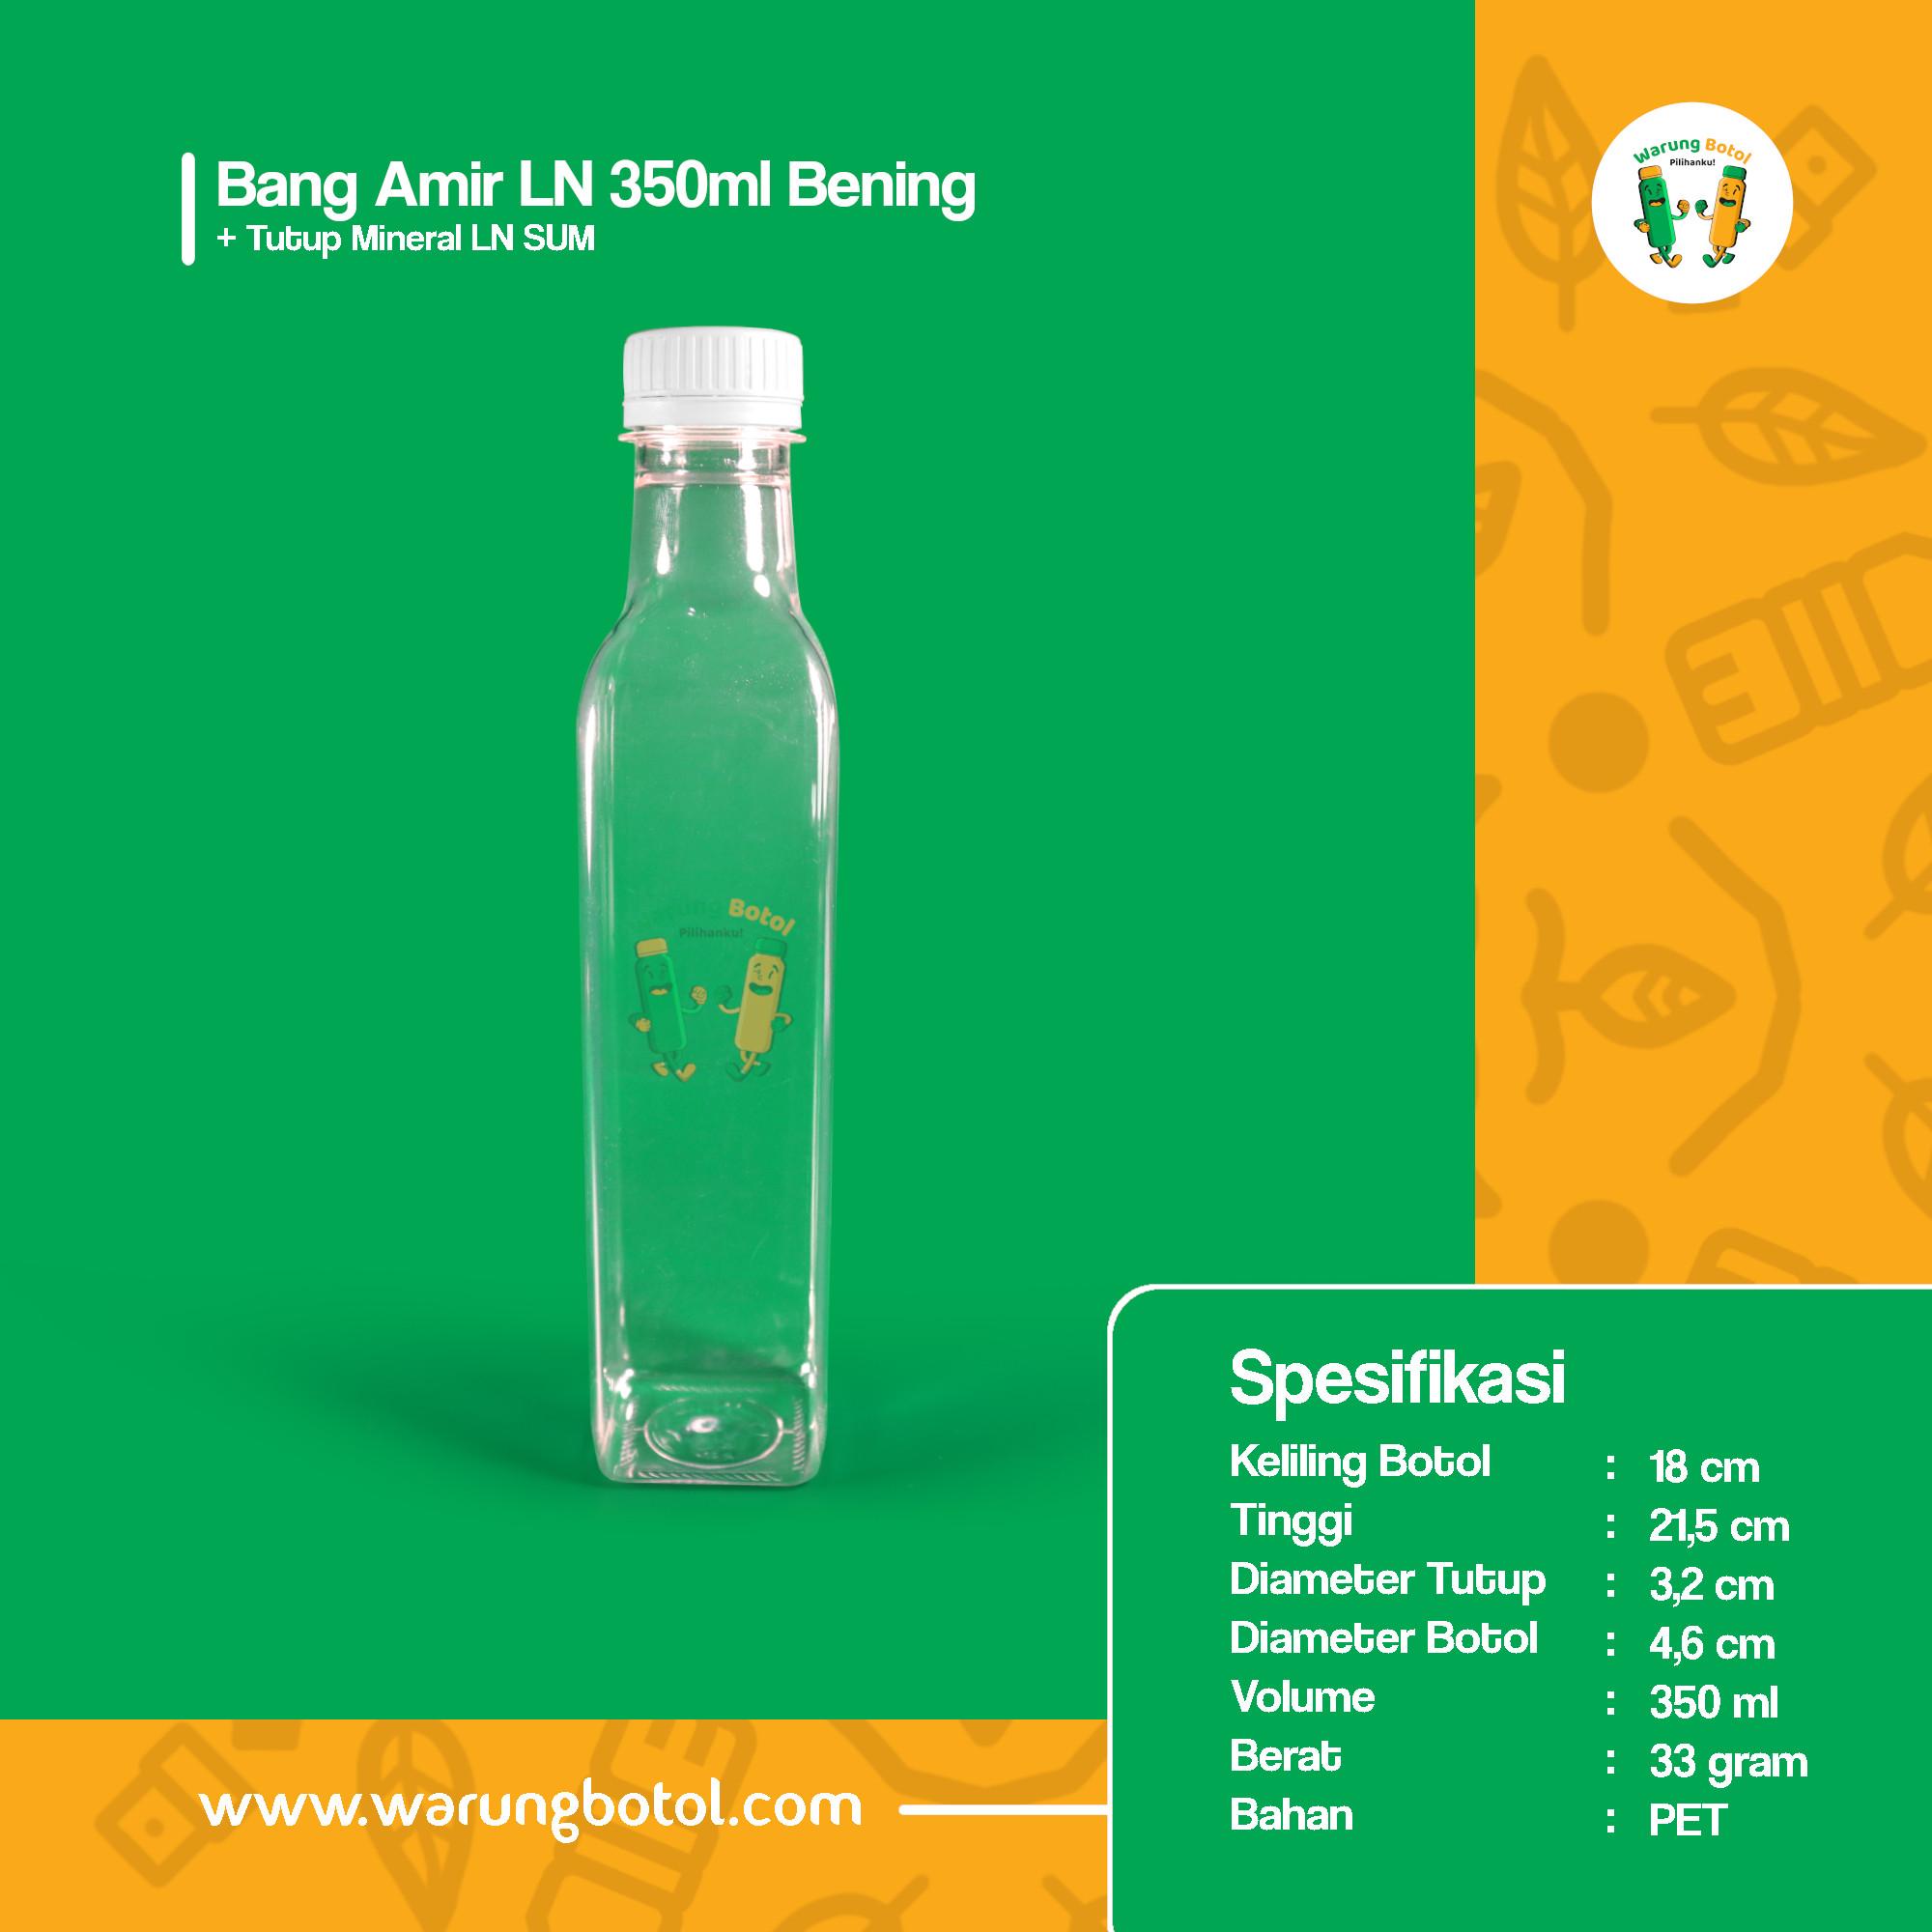 distributor jual botol plastik unik 350ml bening murah terdekat bandung jakarta bogor bekasi